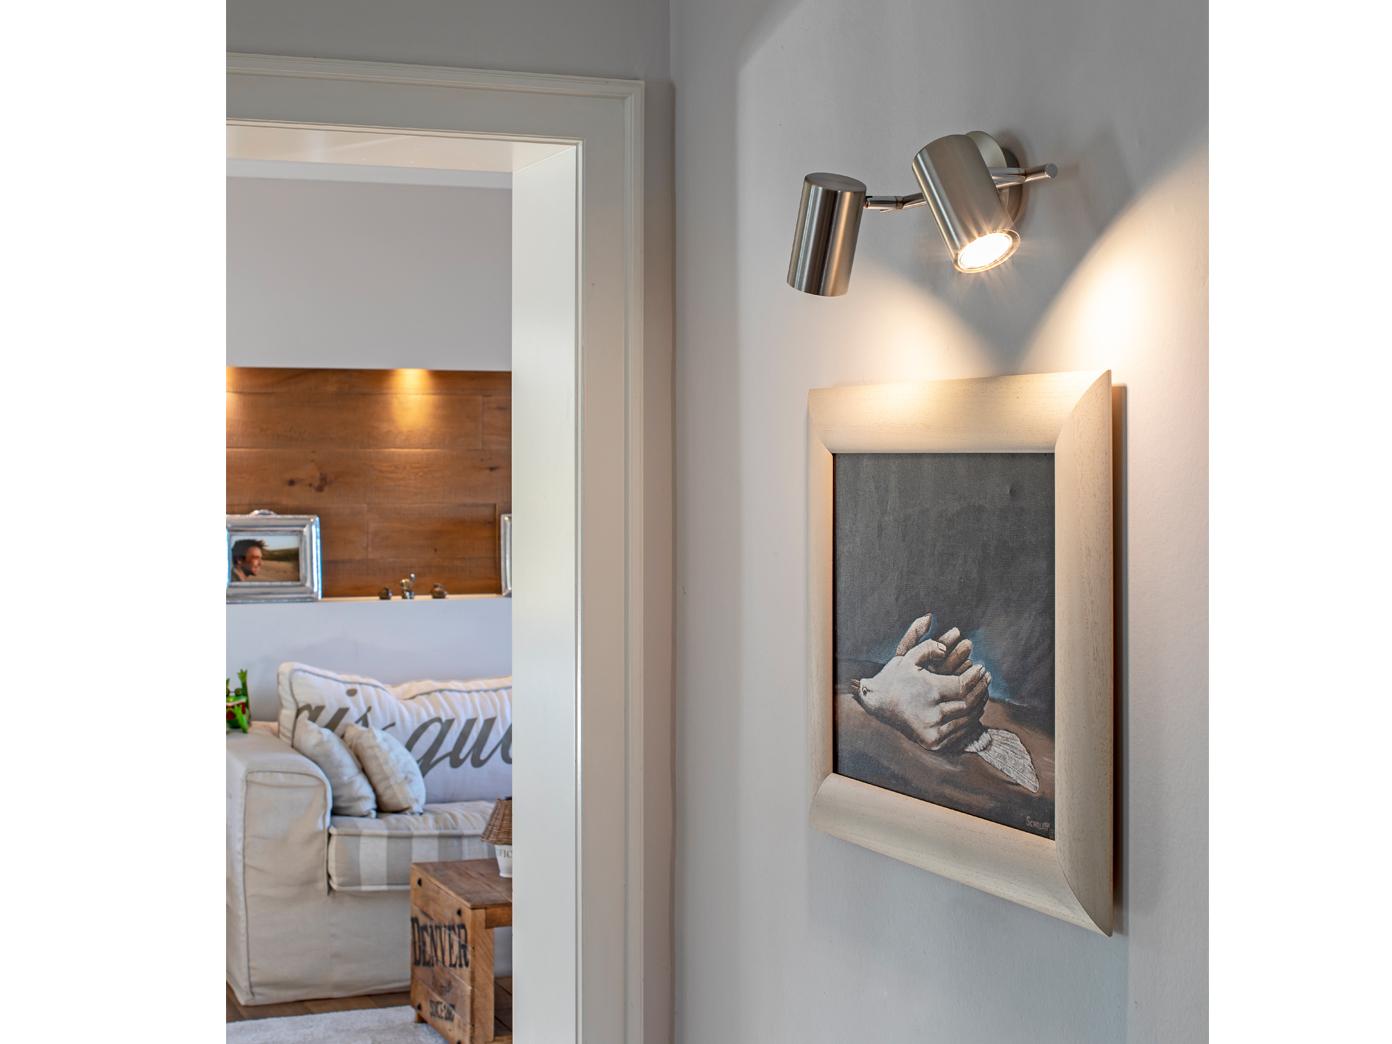 LED Wandstrahler Nickel matt Spot schwenkbar 6W GU10 - Wandleuchten  Schlafzimmer